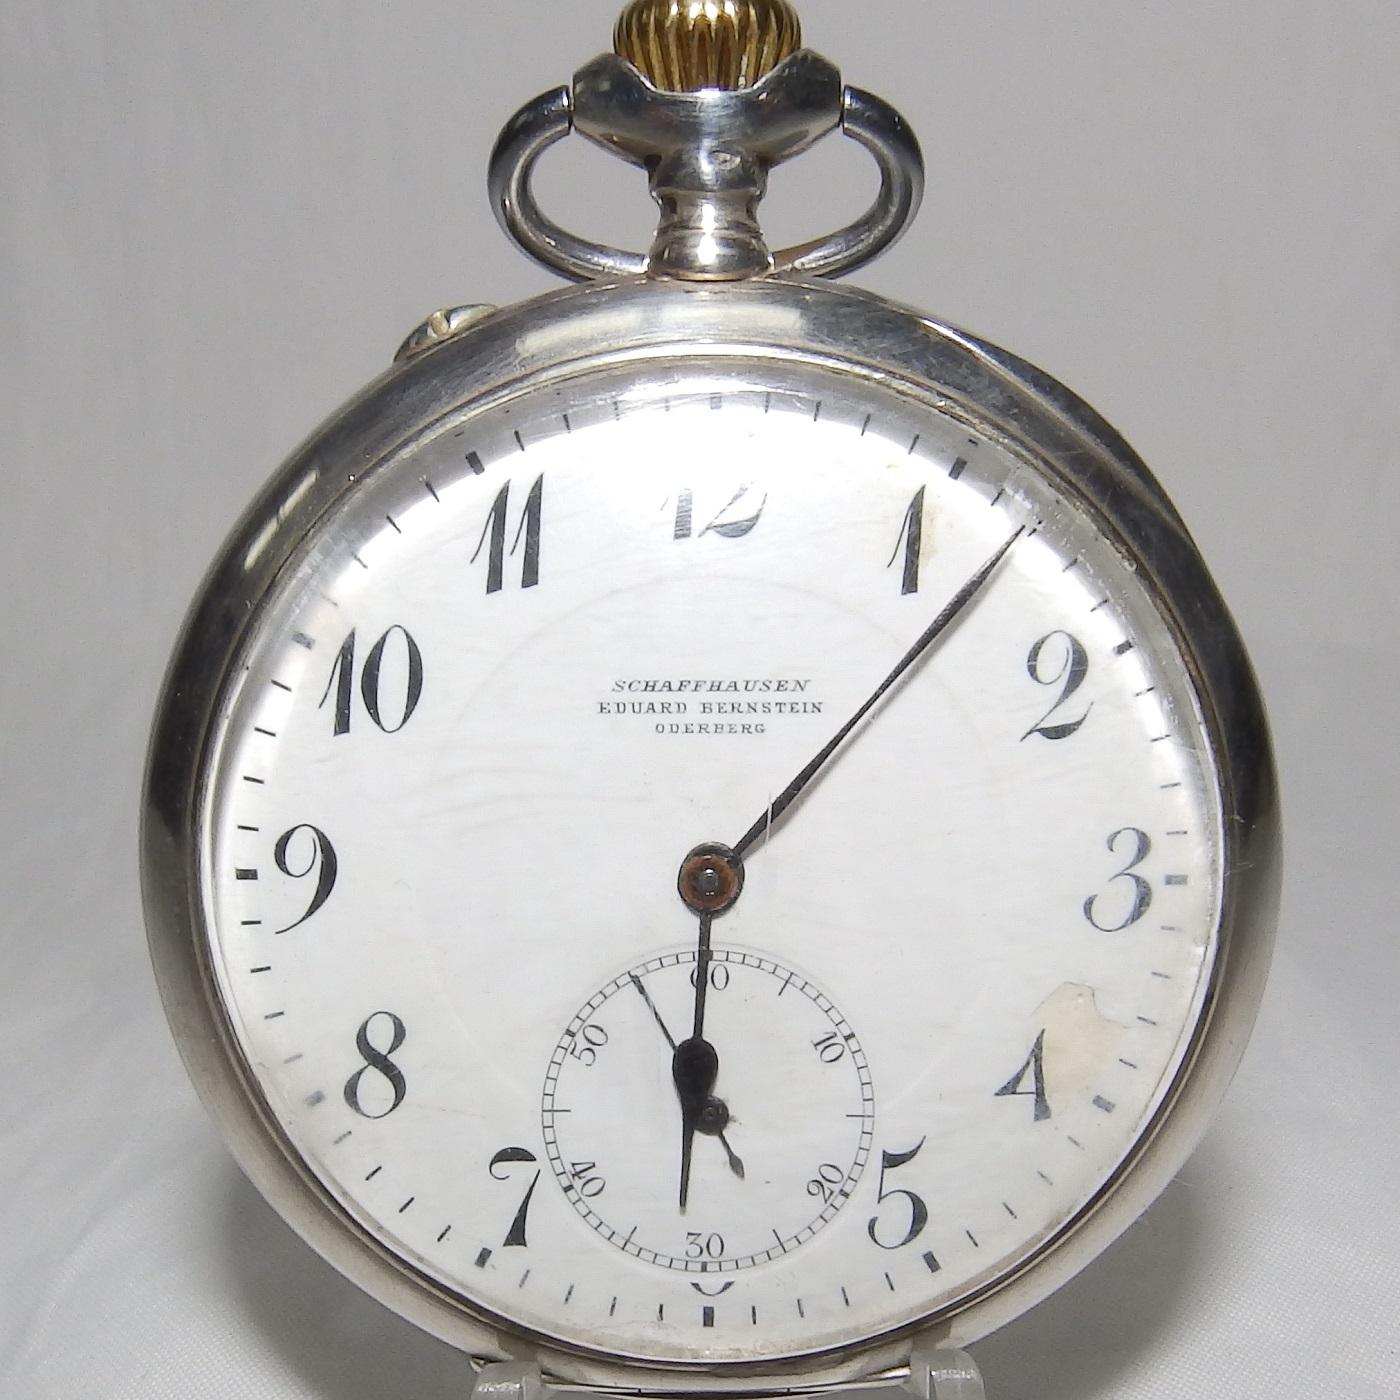 International Watch Company. Reloj de Bolsillo para caballero, lepine y remontoir. Ca. 1912-13.